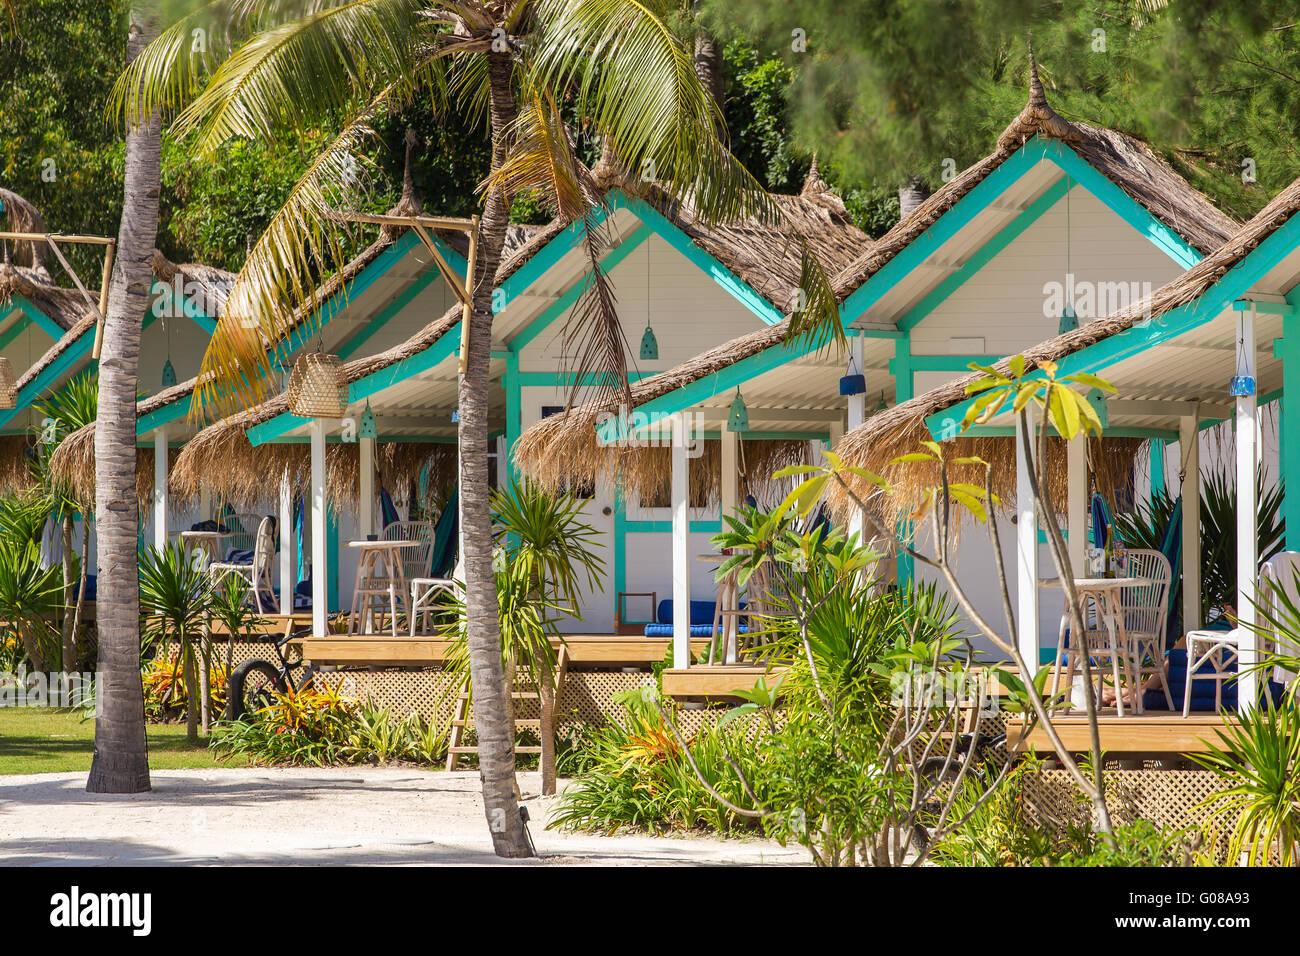 Tropical beach bungalow on ocean shore, Gili Meno, Lombok, Indonesia - Stock Image